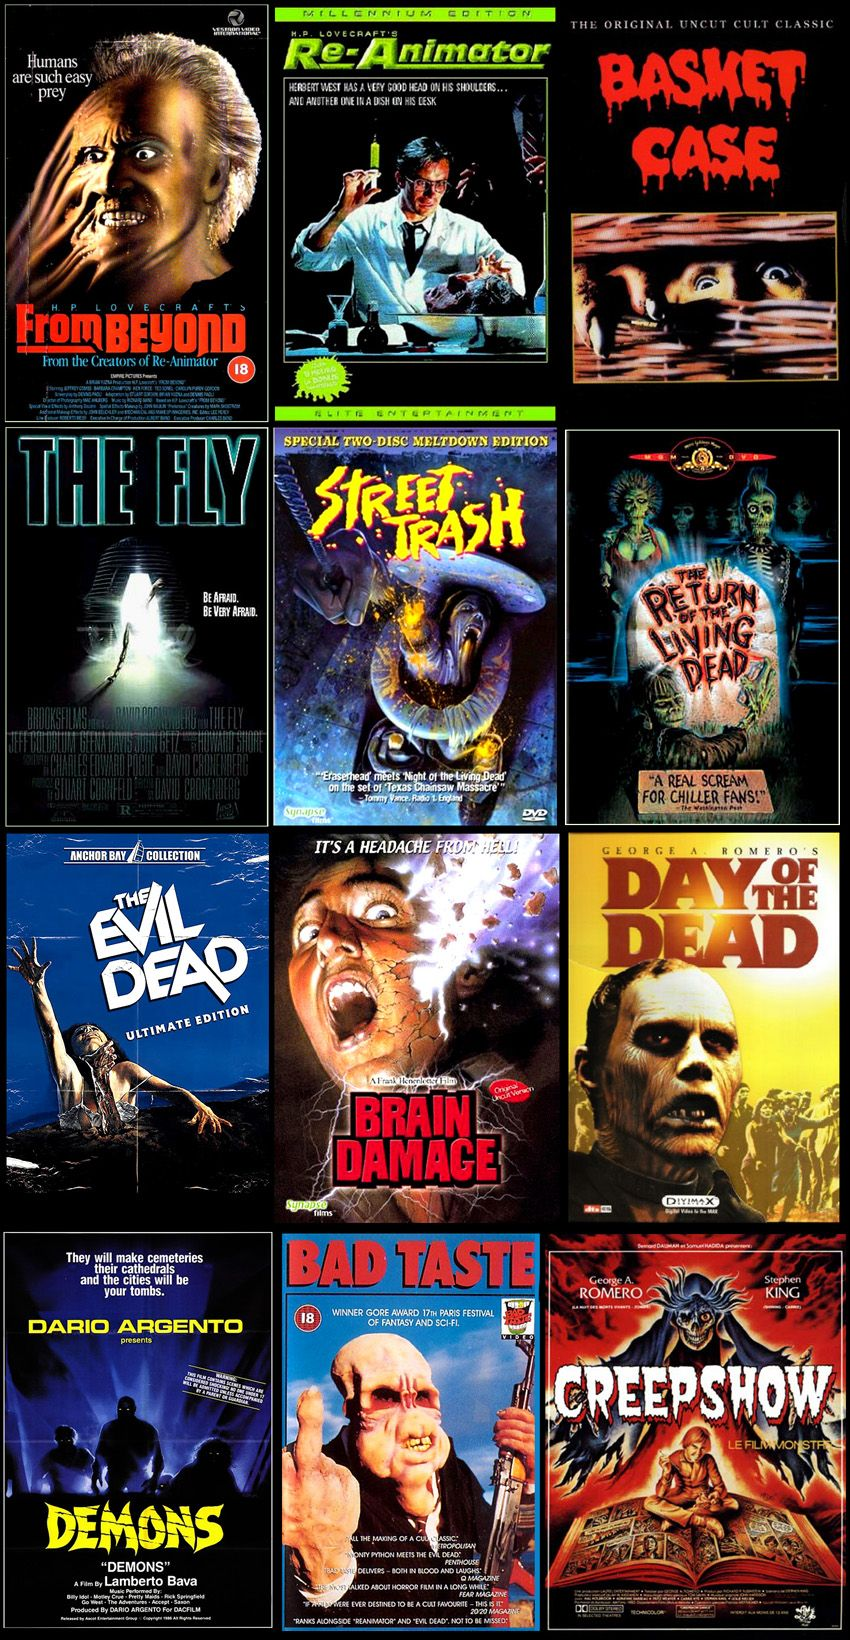 80s horror films are the best terror films rcm